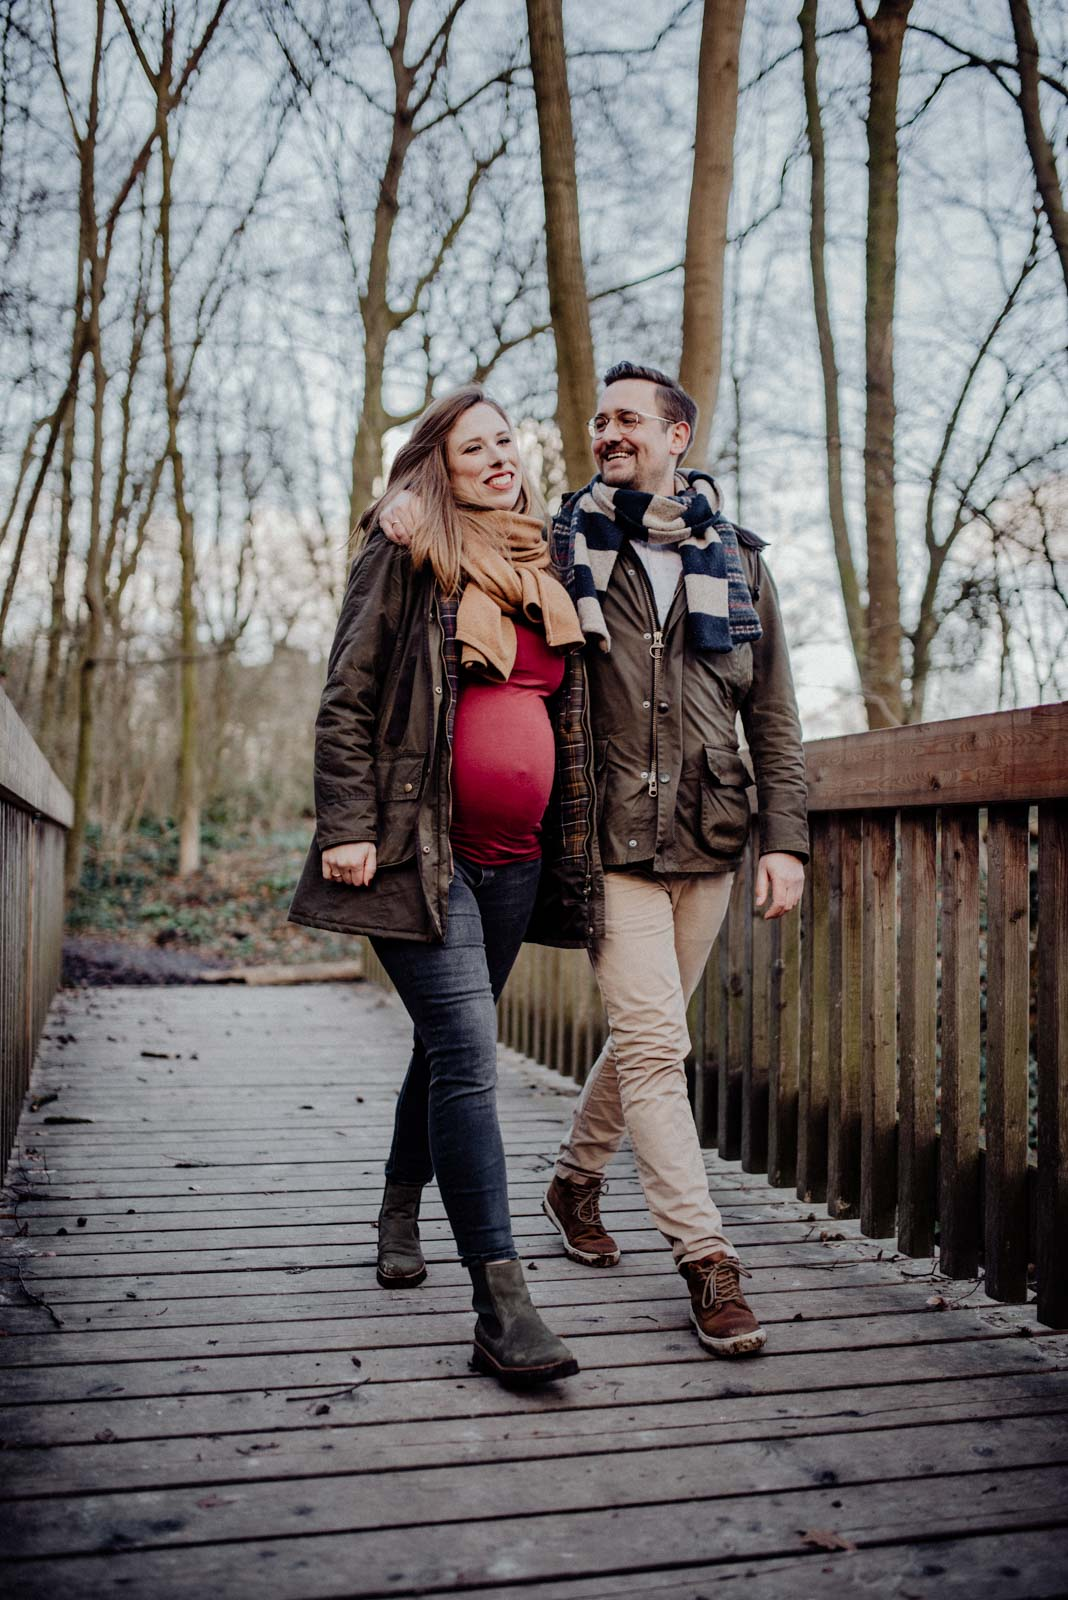 Babybauch-Shooting-Wald-Natur-Witten-Familienfotografie-Familienfotos